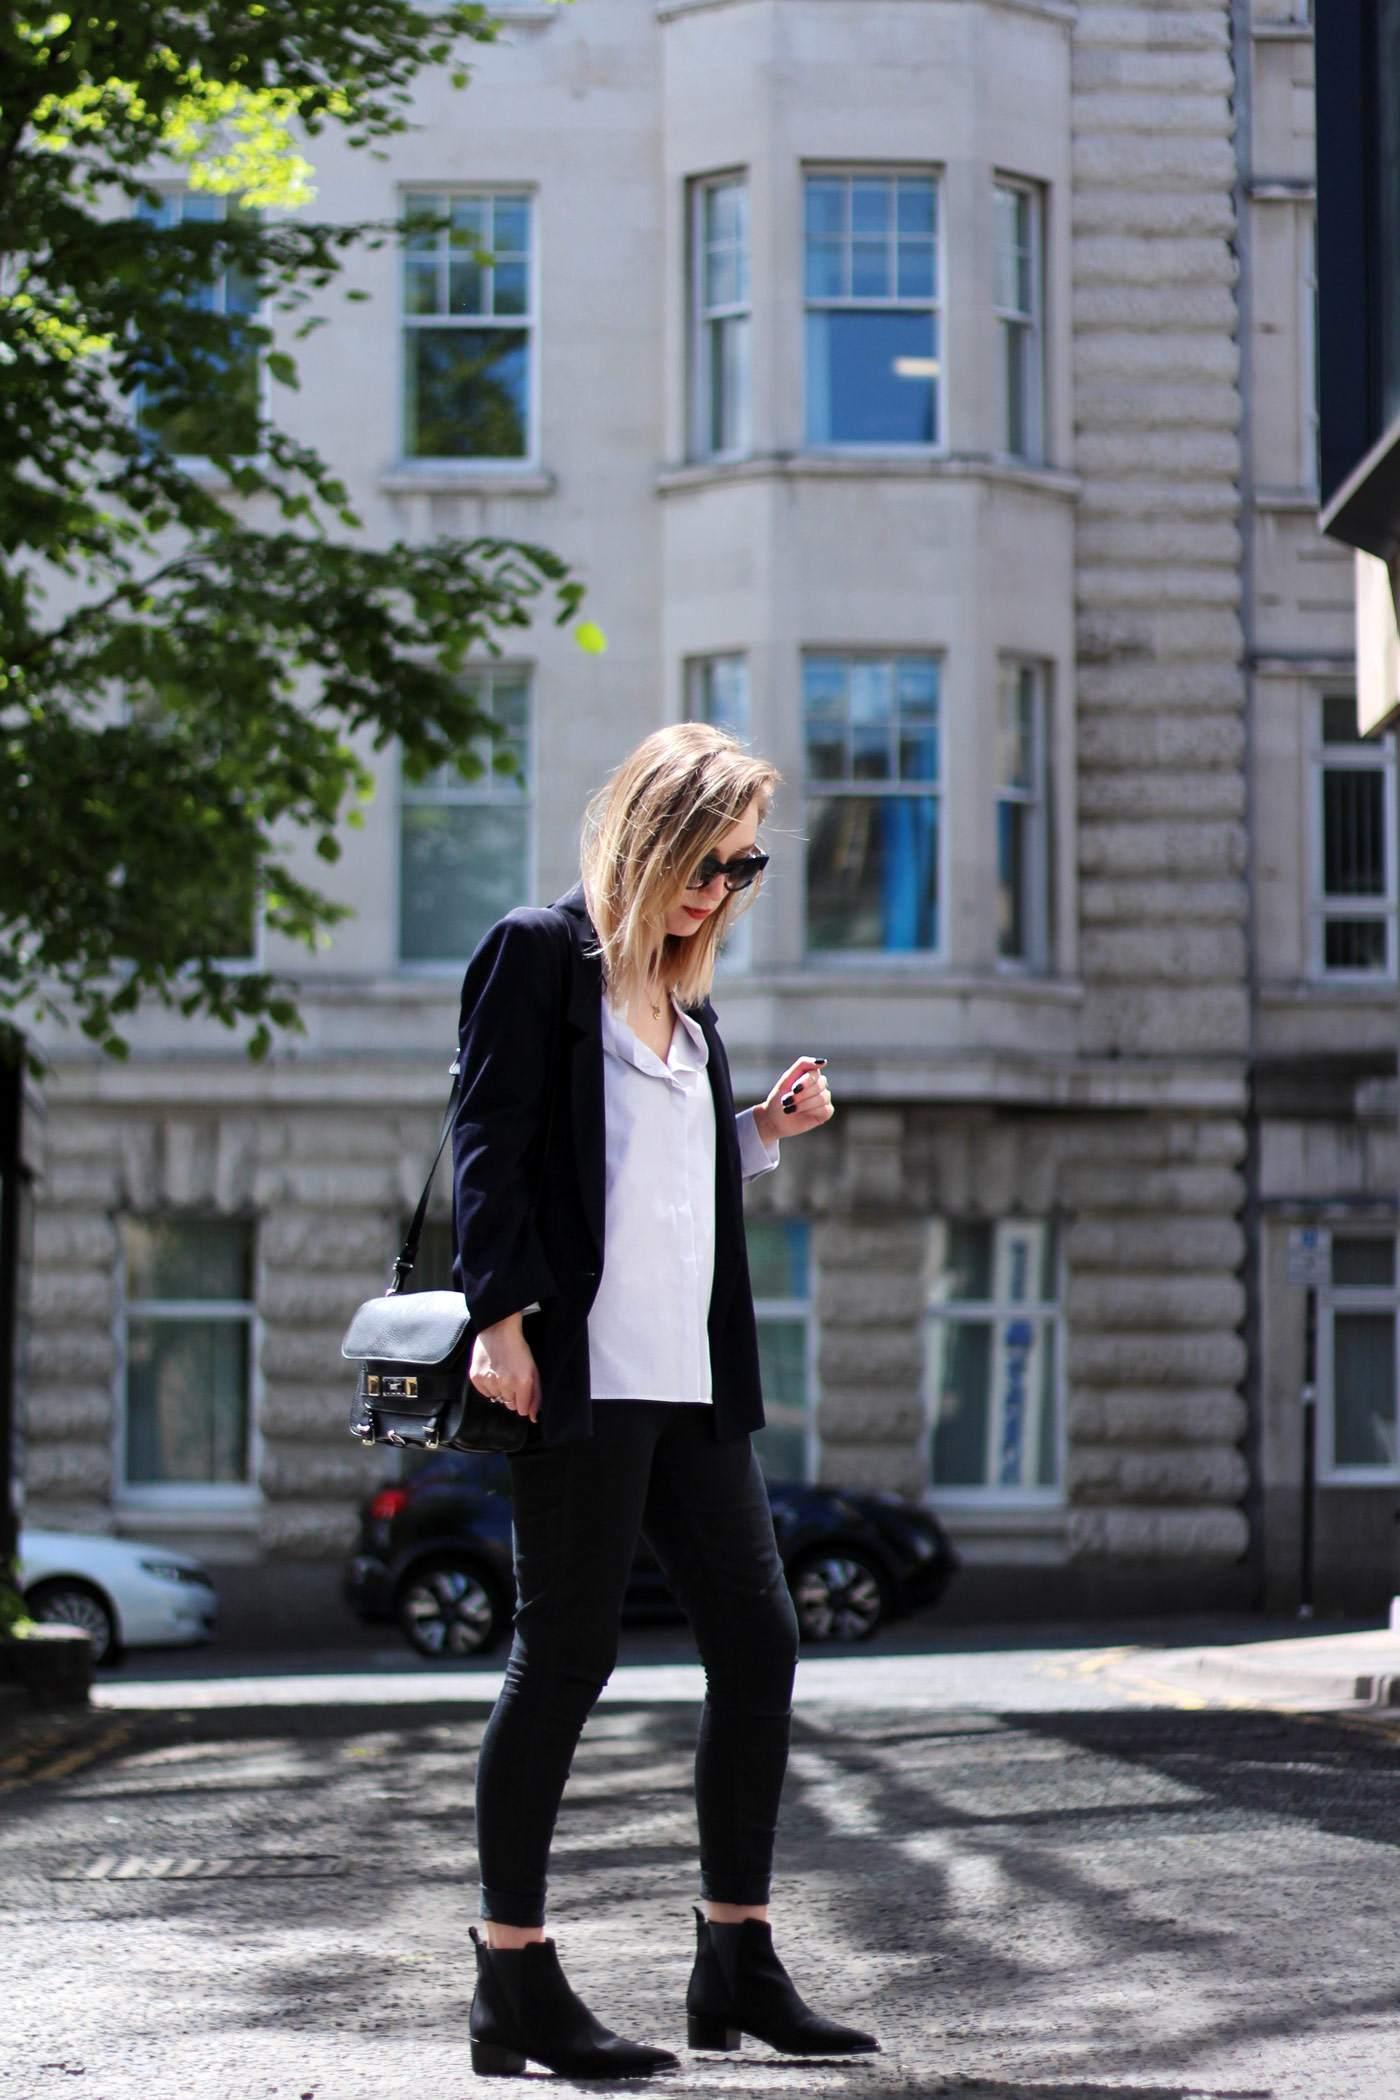 acne-jensen-boots-M&S-alexa-chung-ada-blazer-outfit-5